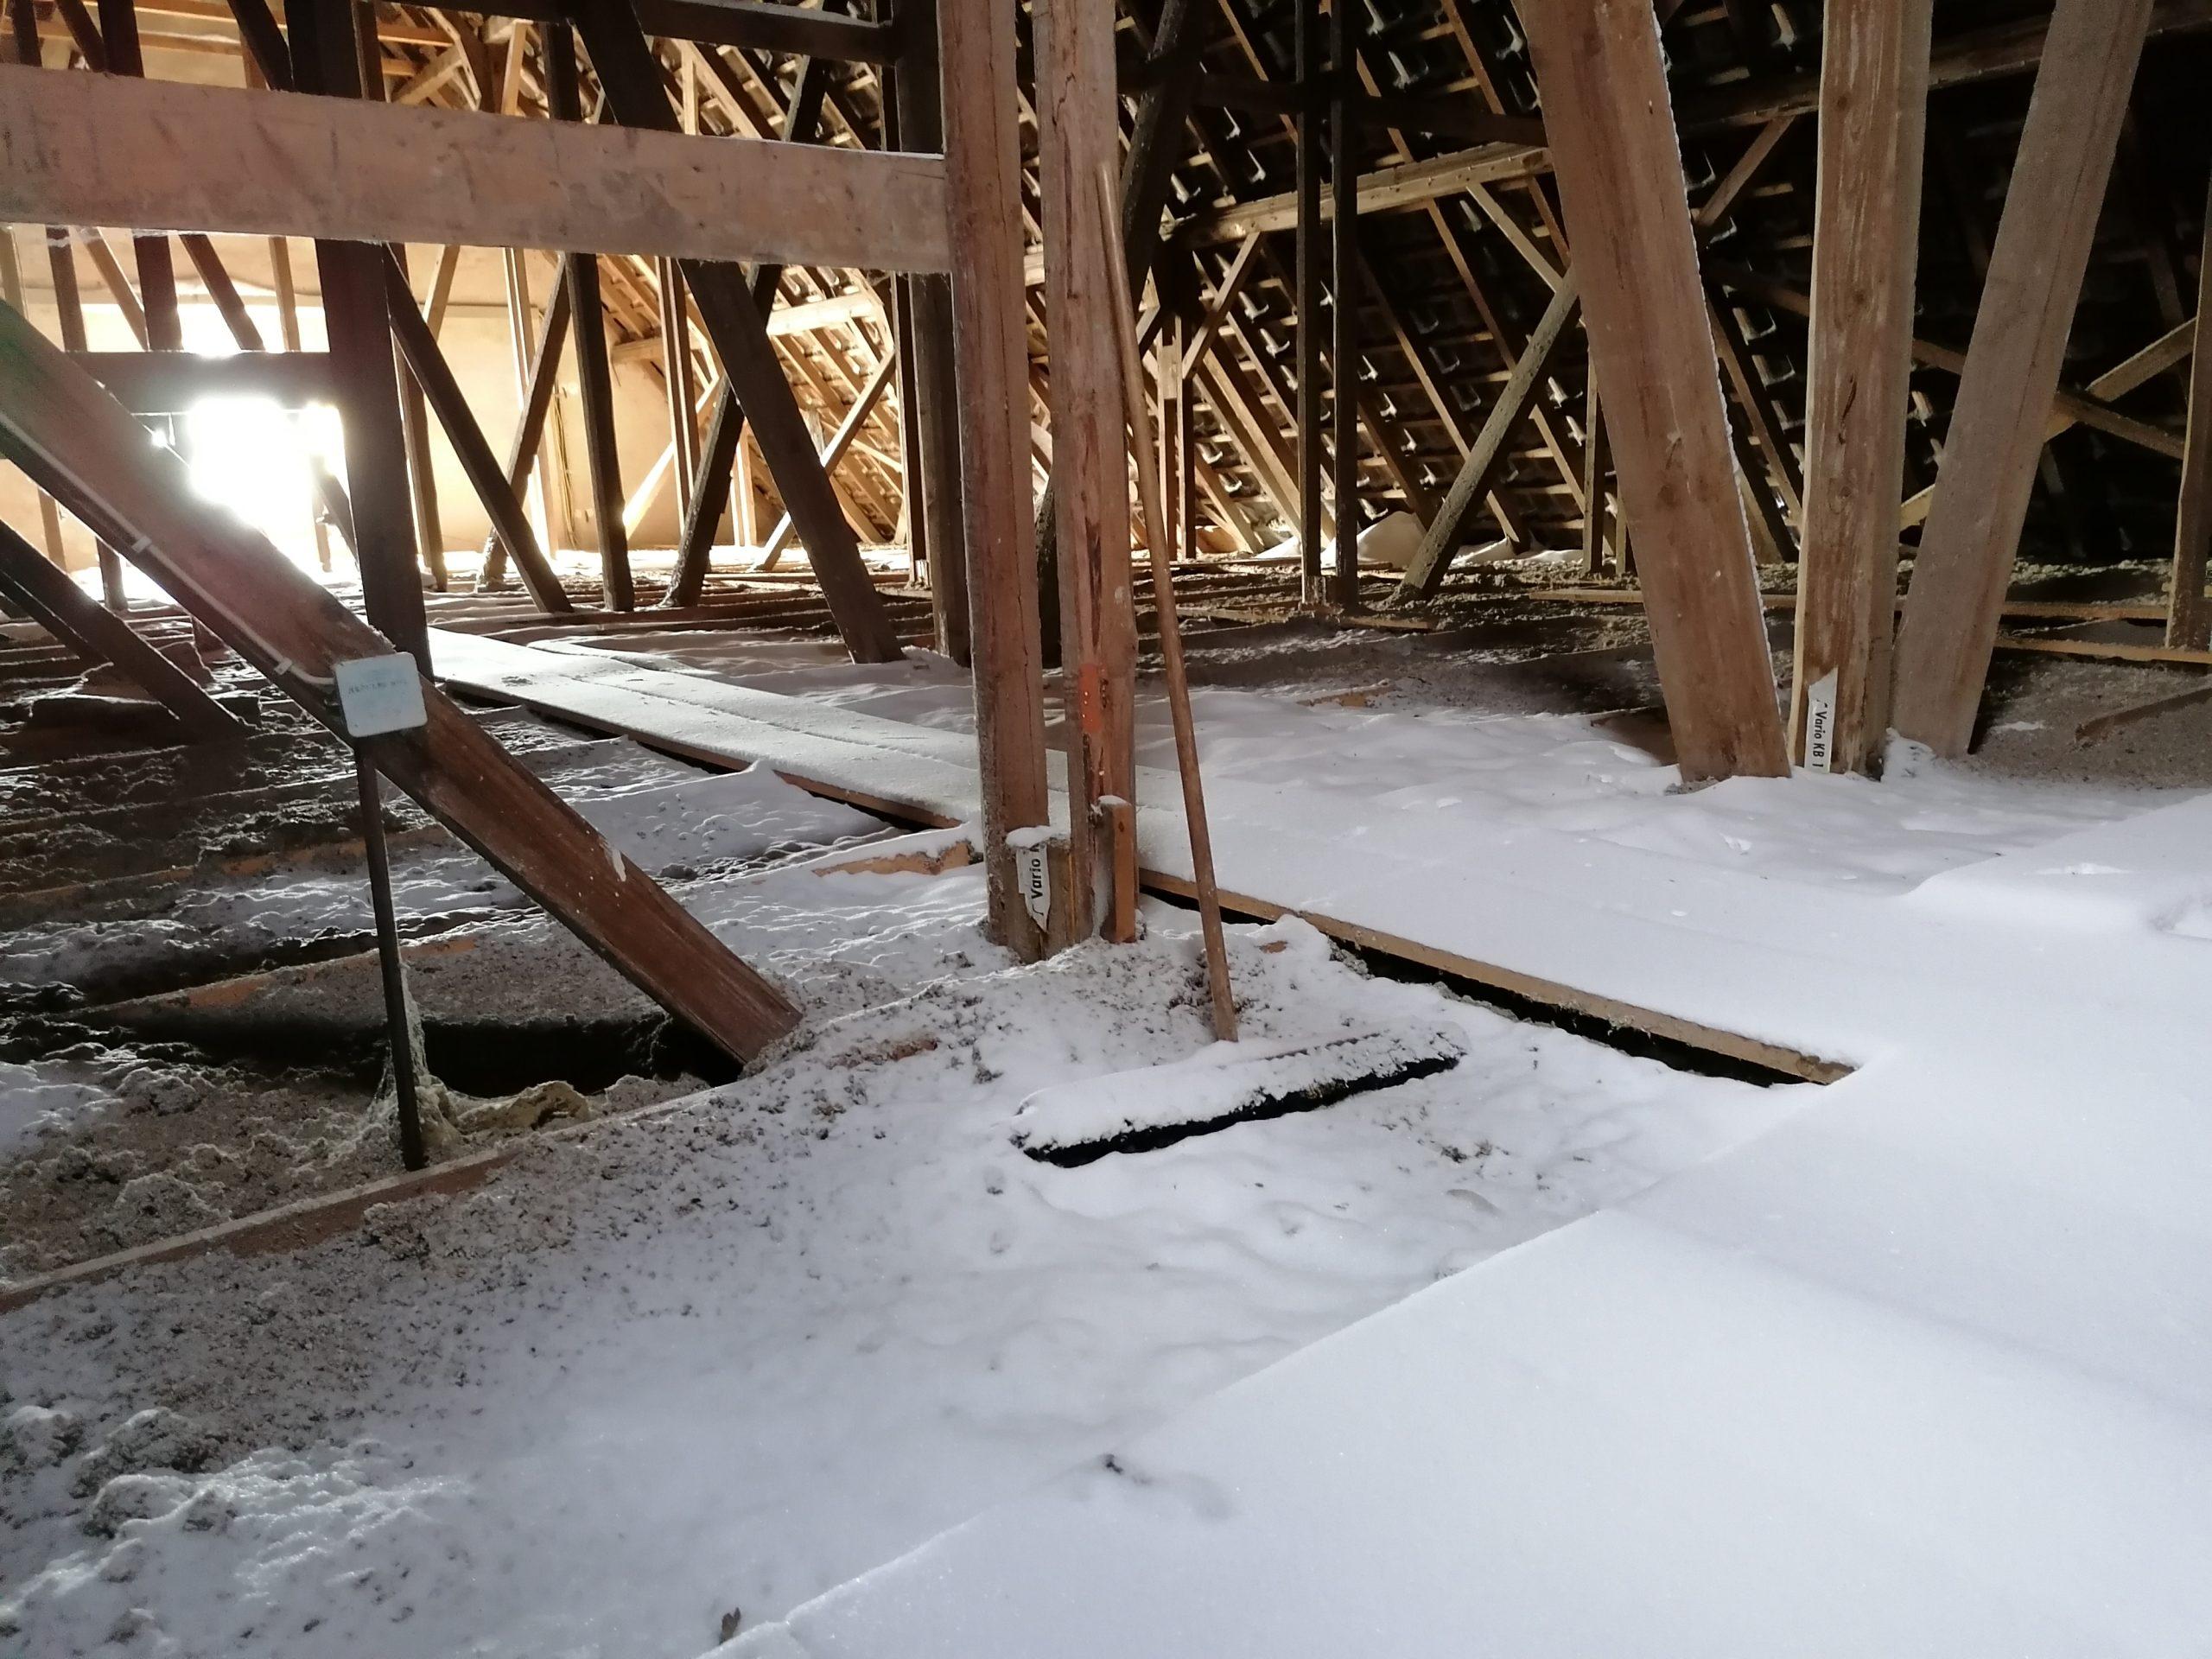 Kirche Sylbach Dachboden nach Schneesturm 2